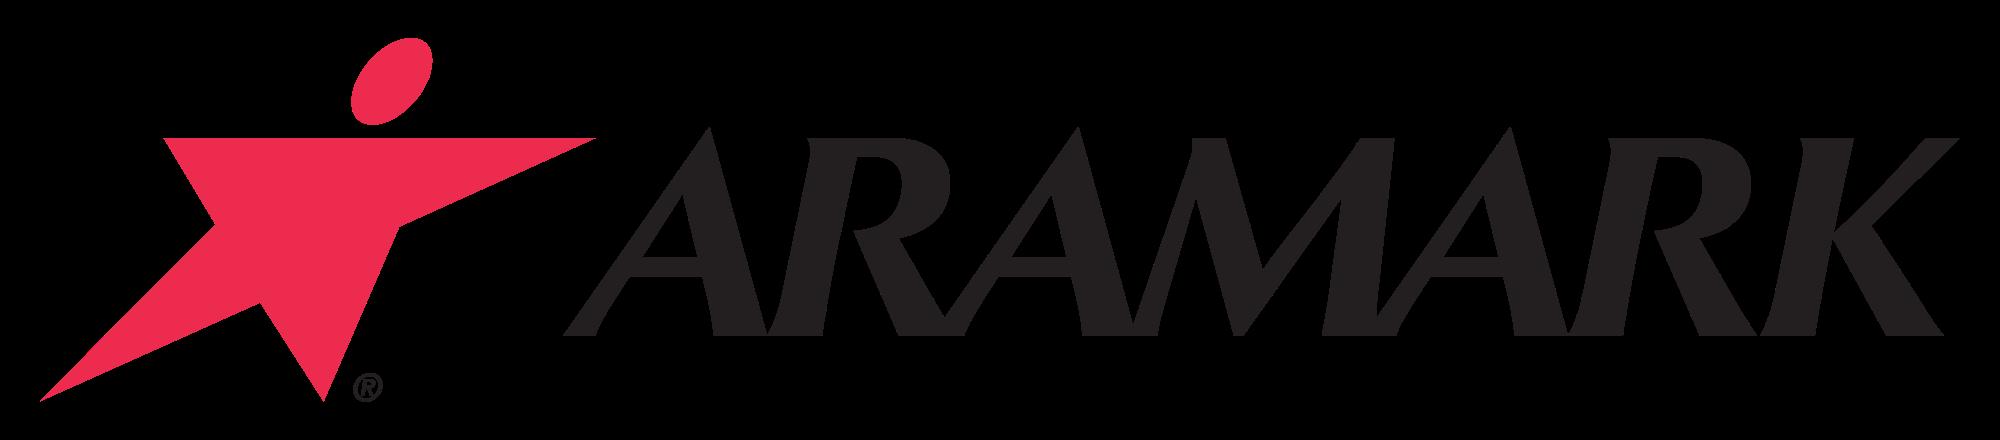 Aramark-Logo.svg